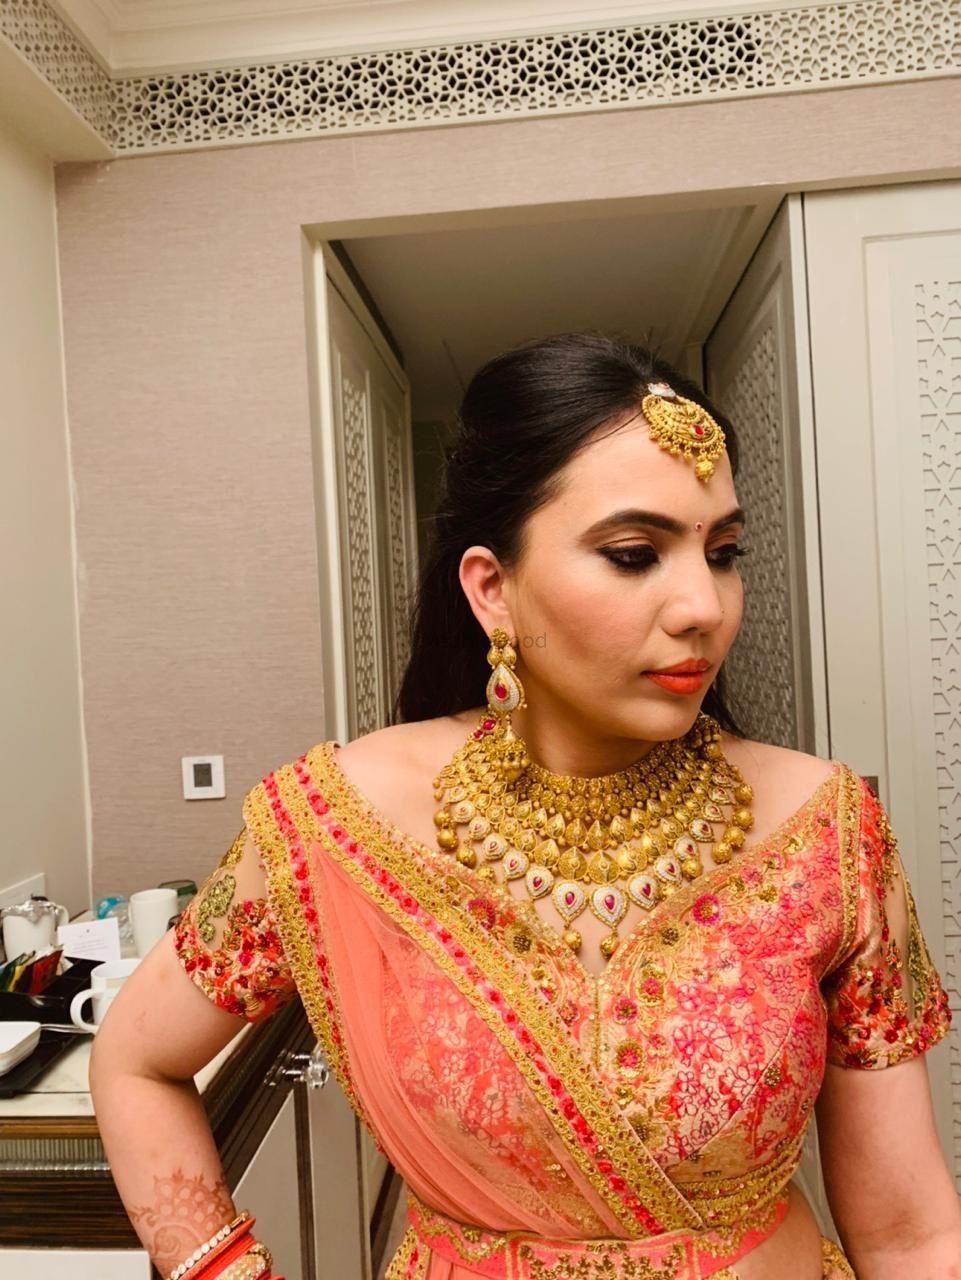 Photo From Mainka Choudhary - By Yogesh Sharma Make Up Artist